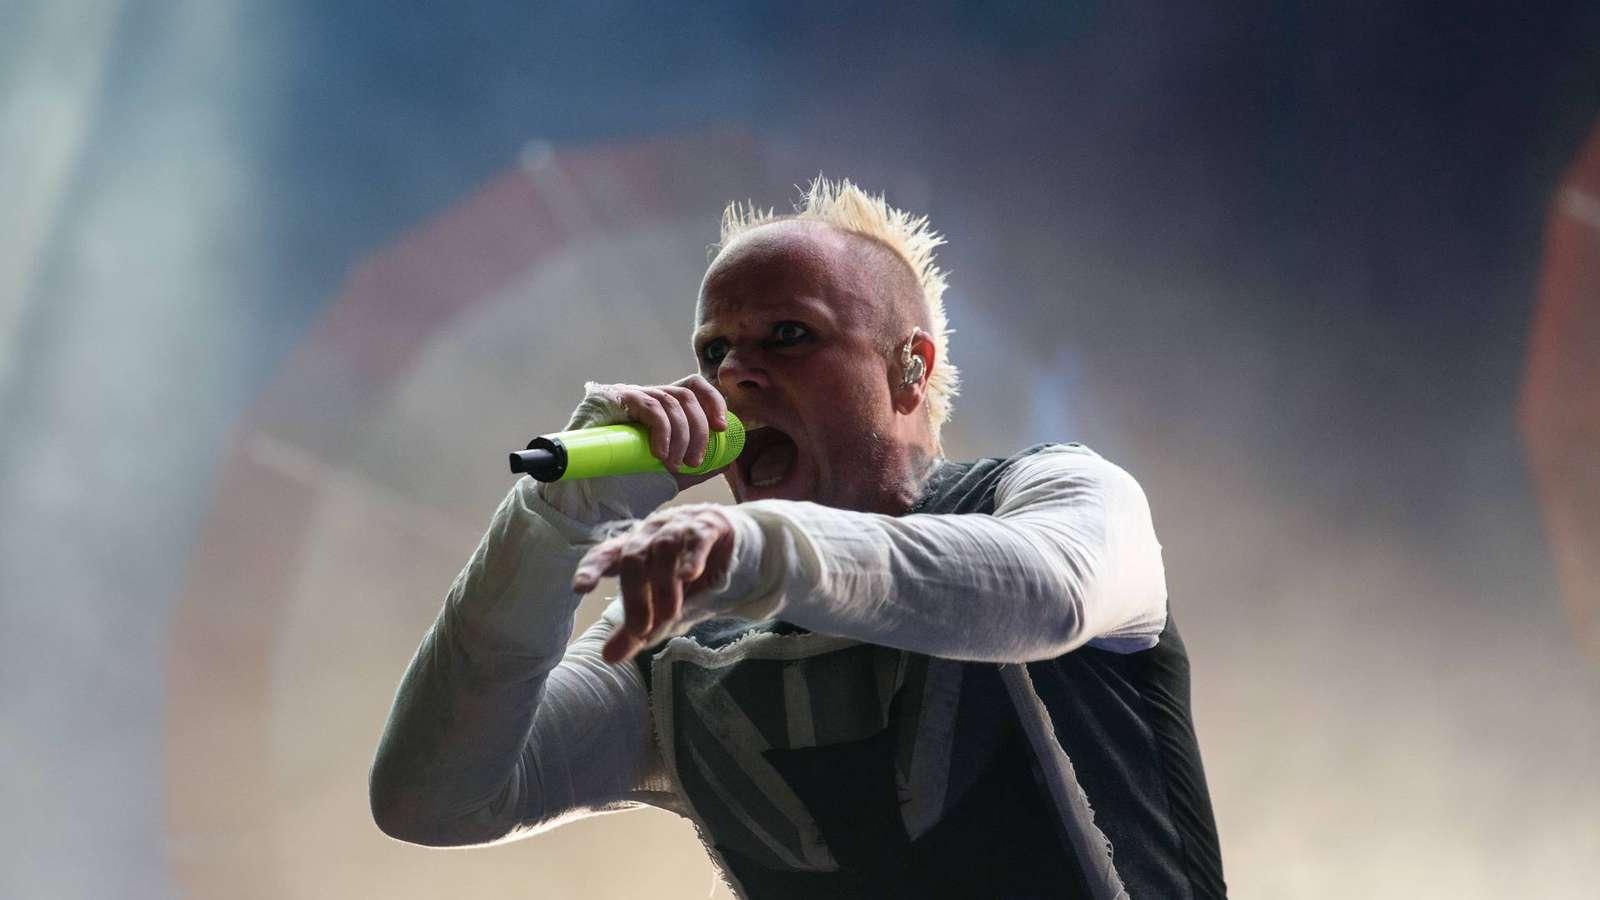 Elhunyt Keith Flint, a Prodigy frontembere